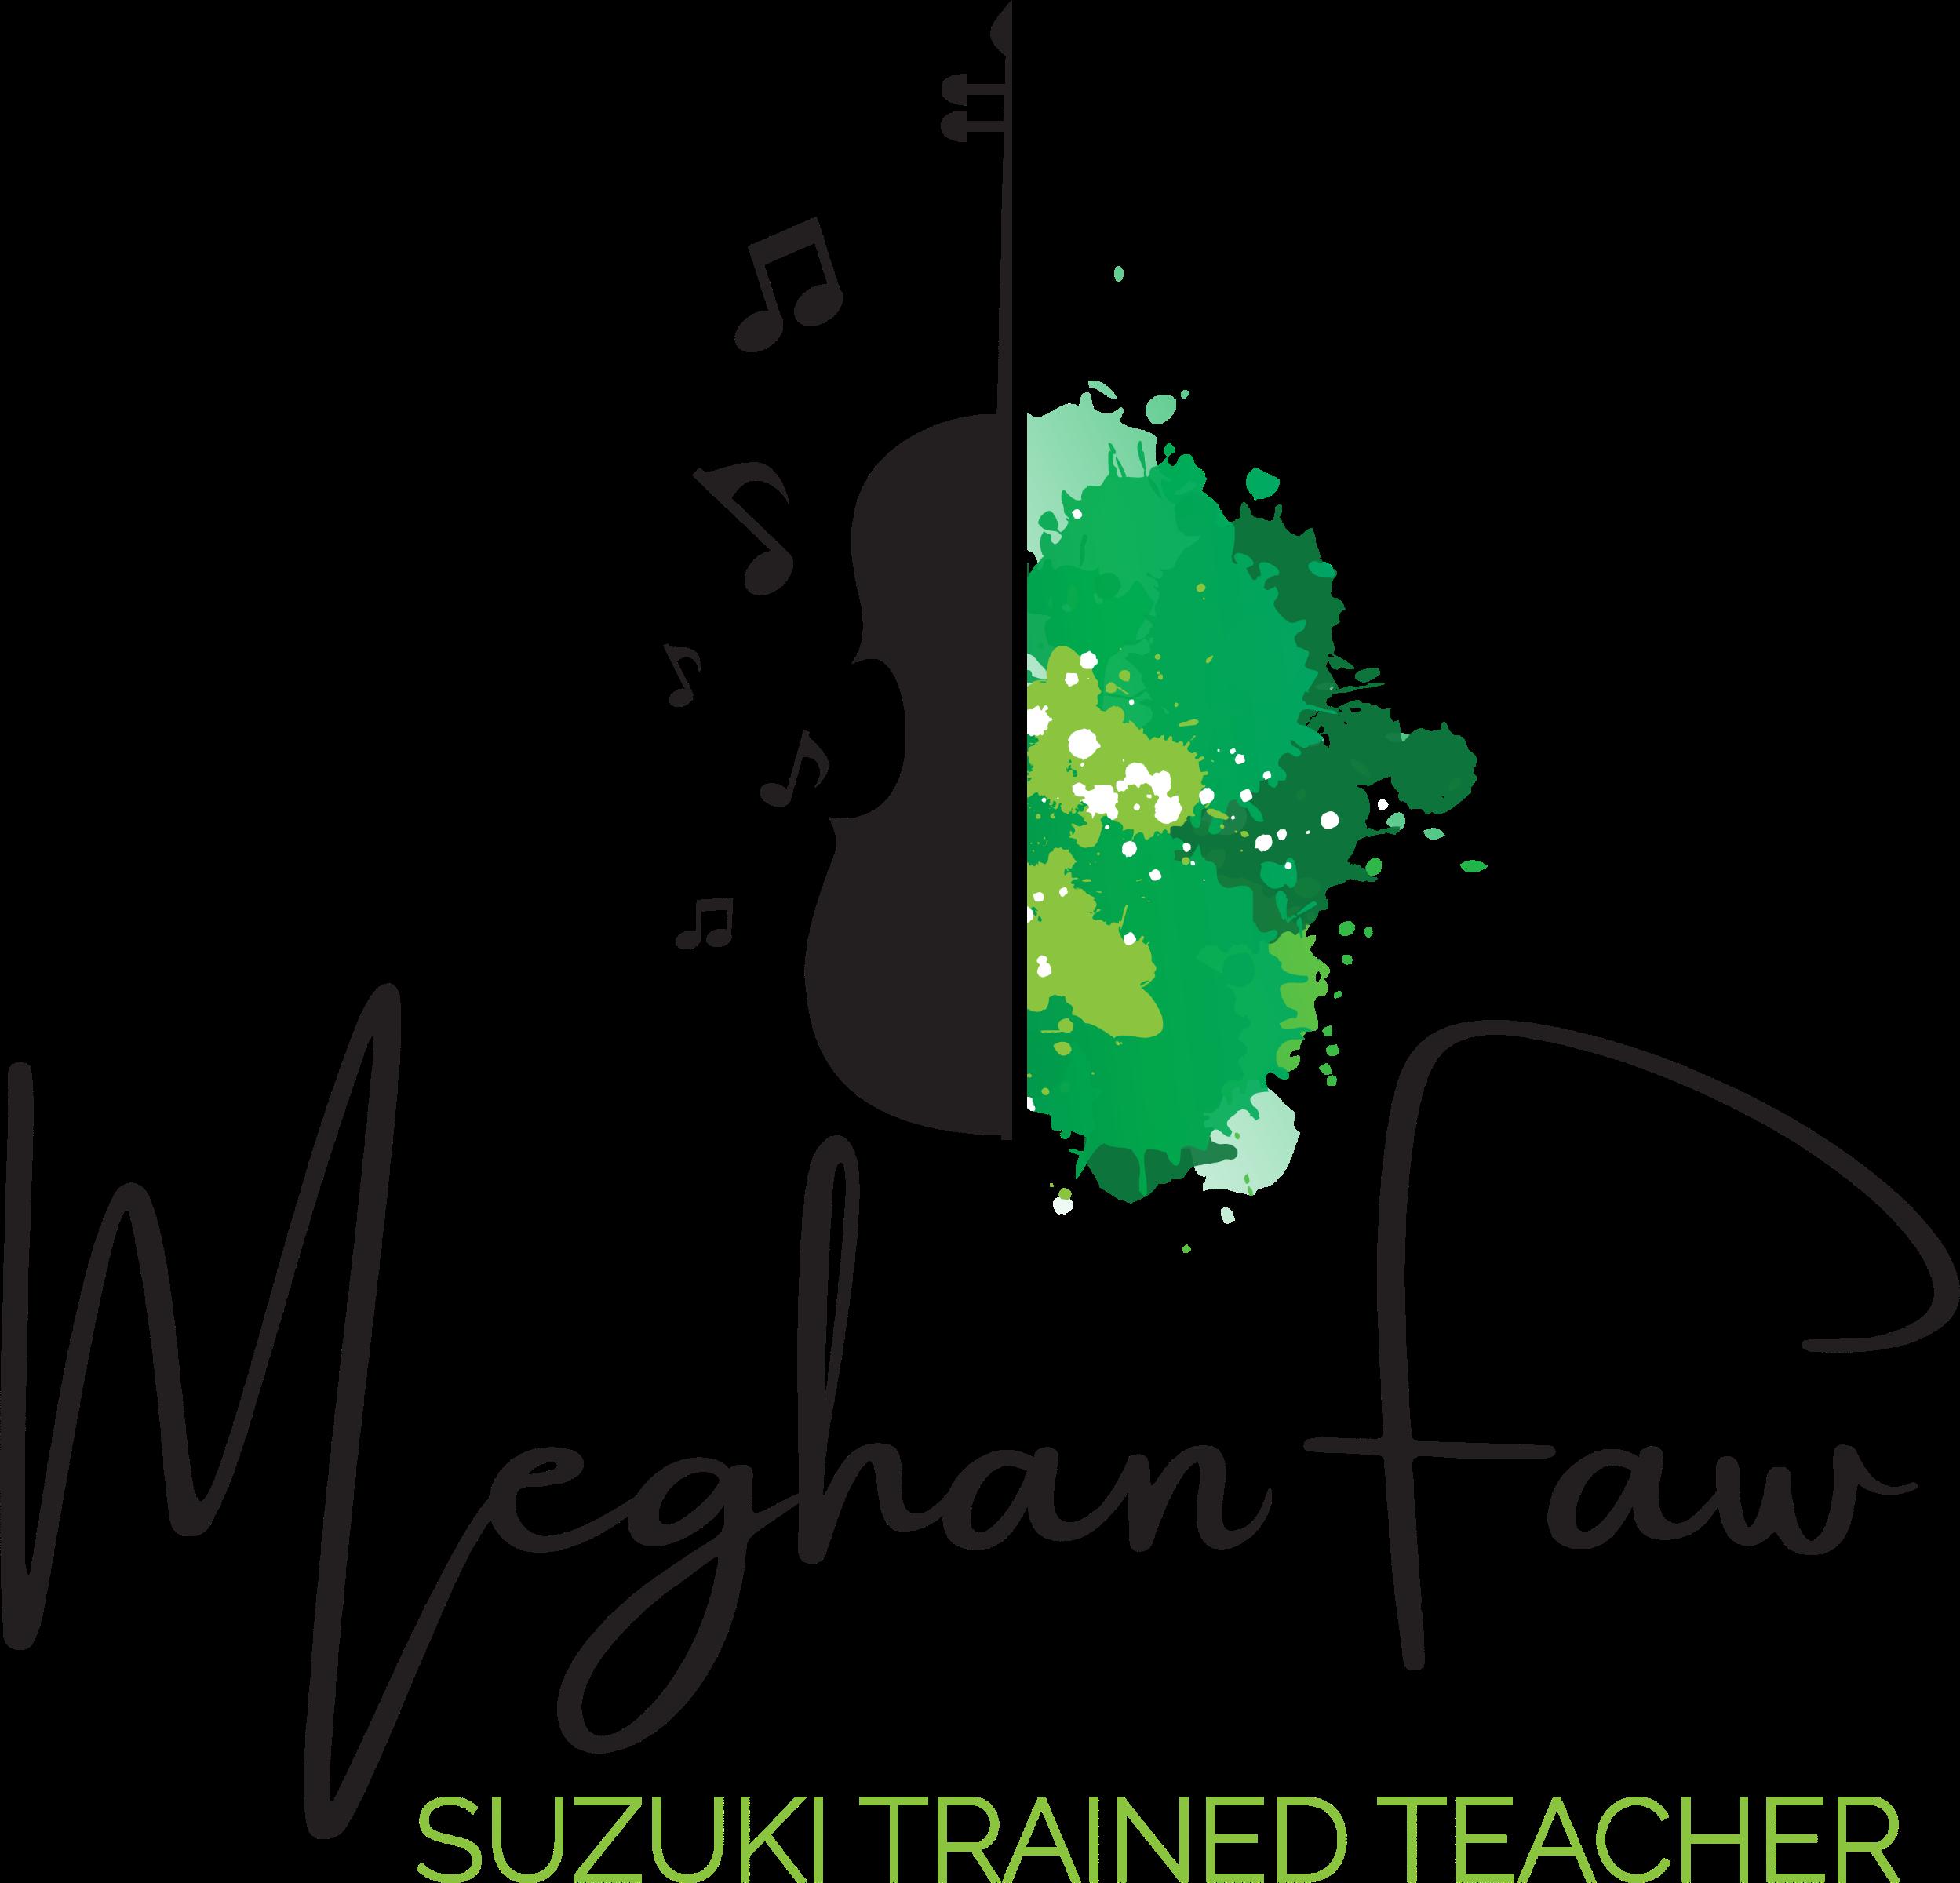 Meghan Faw